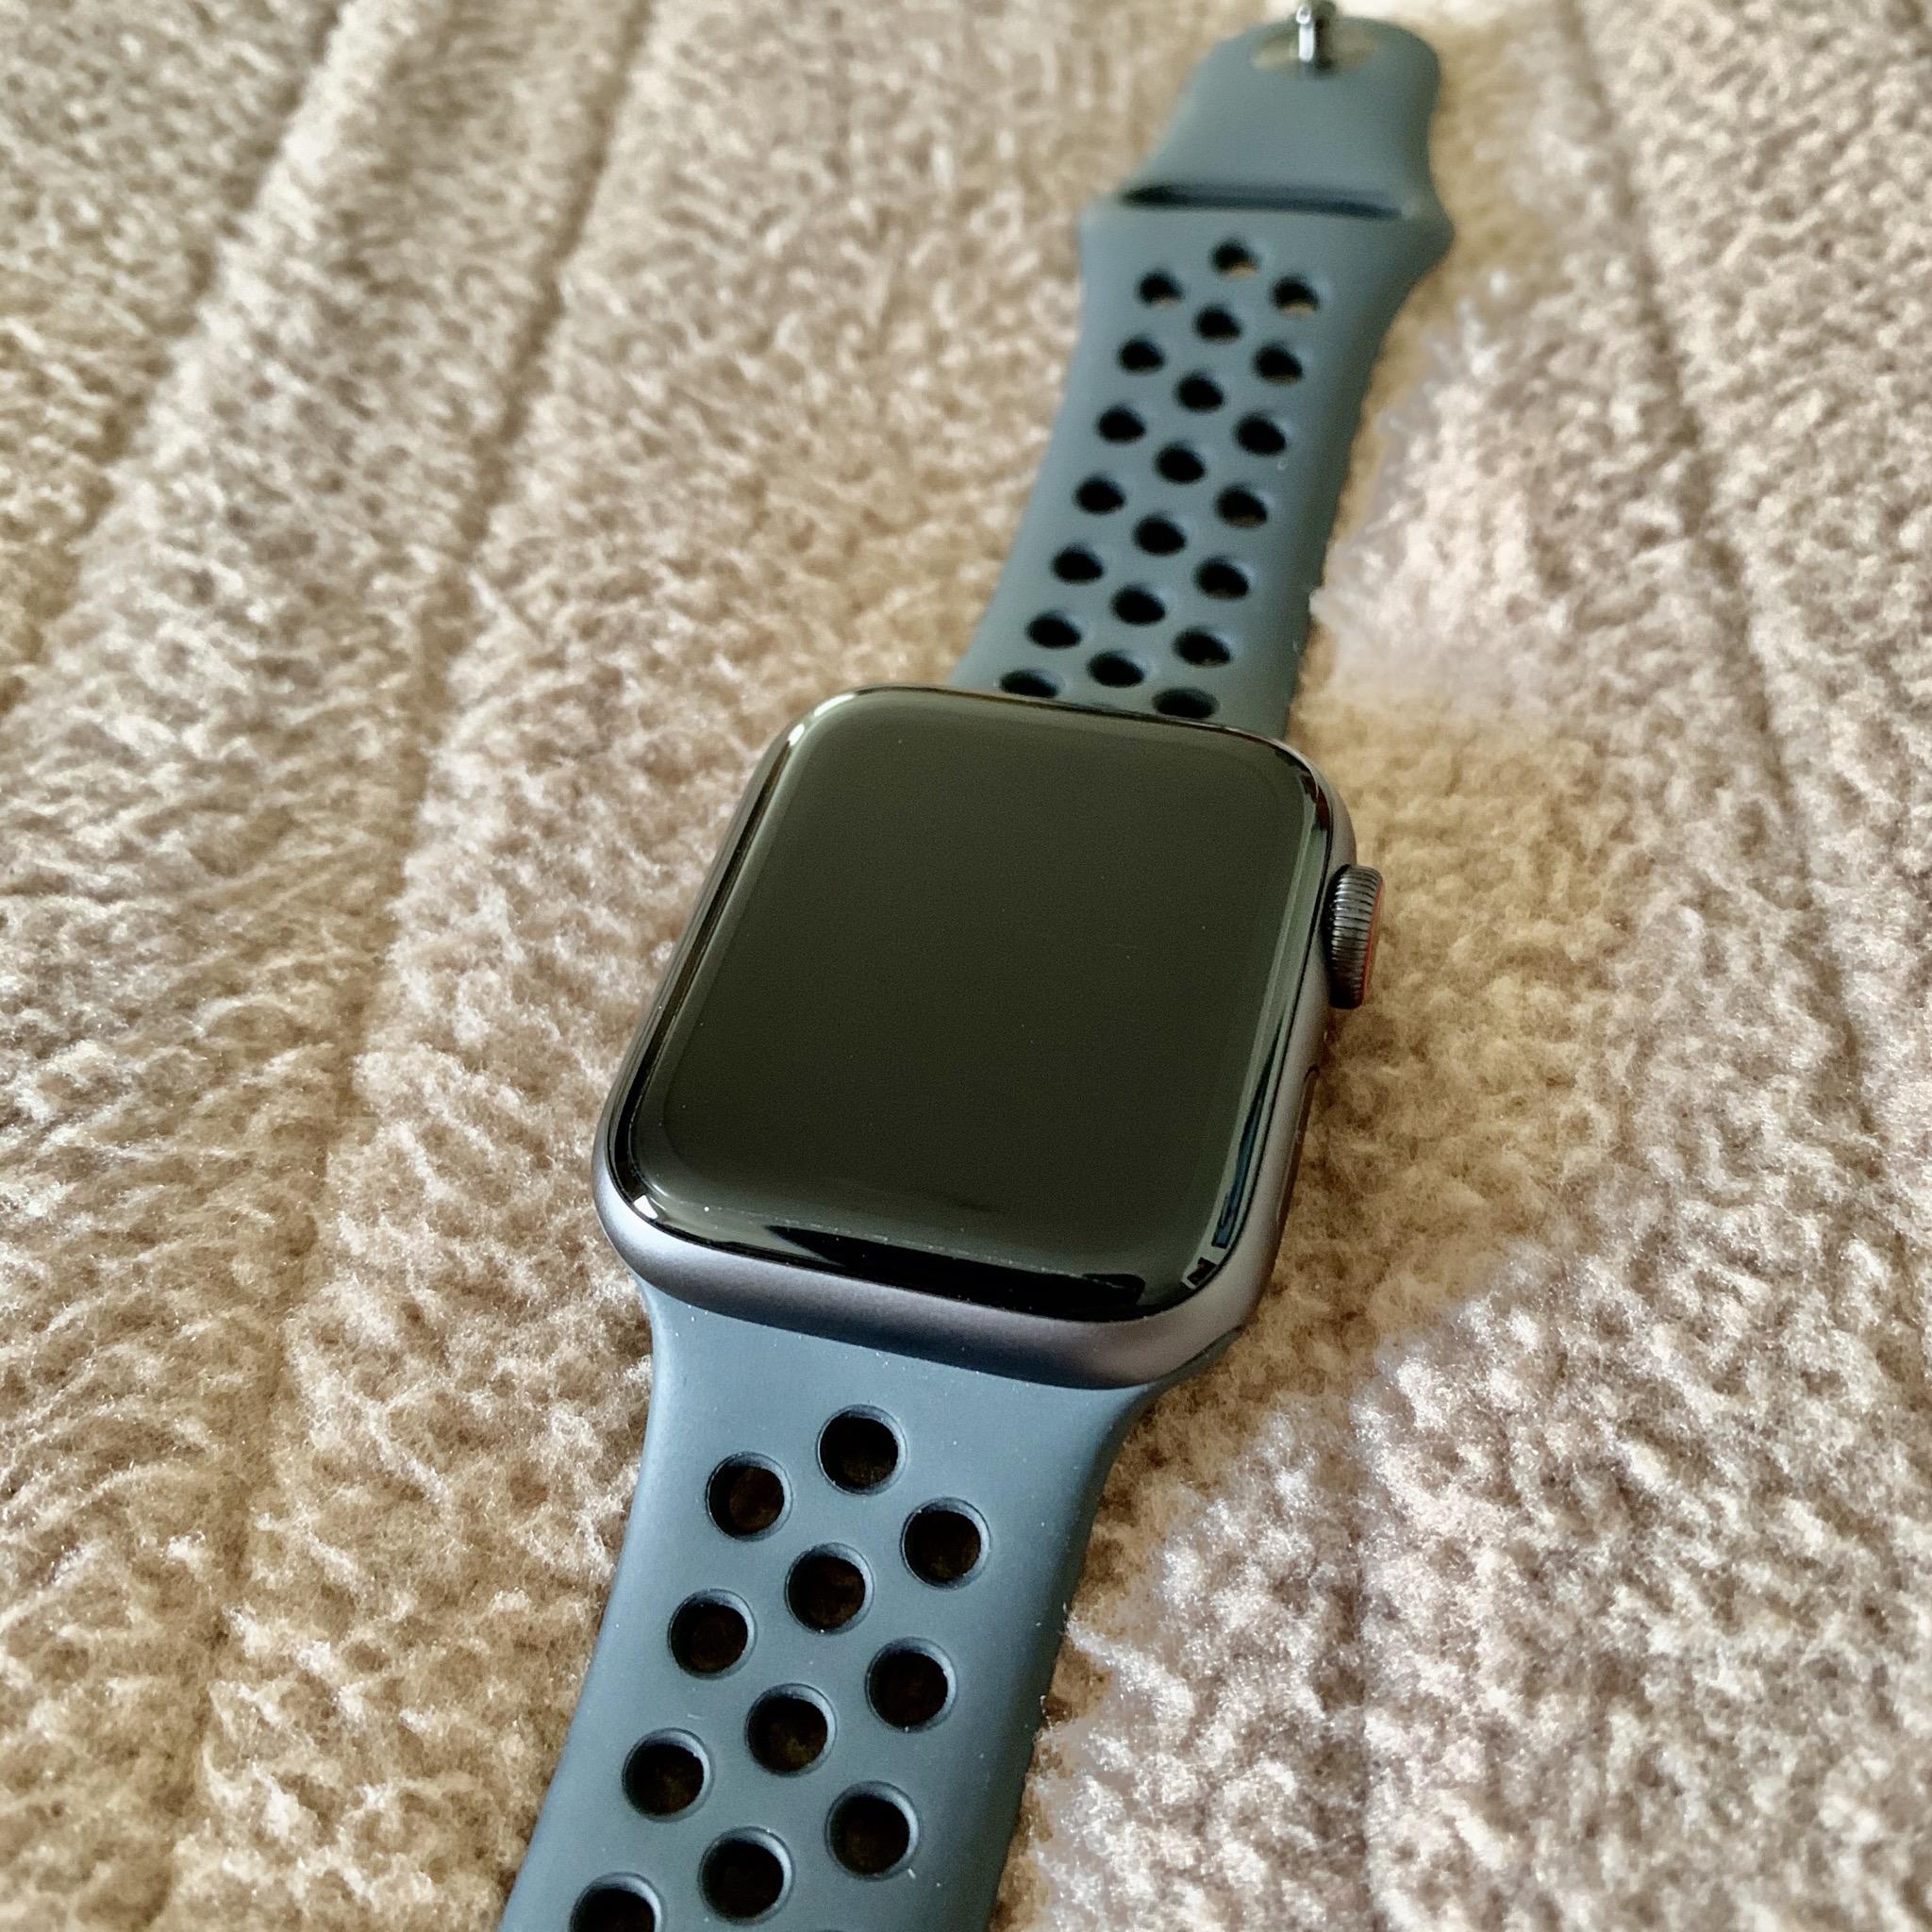 Rubí secuencia Vacante  Apple Watch - Wikipedia